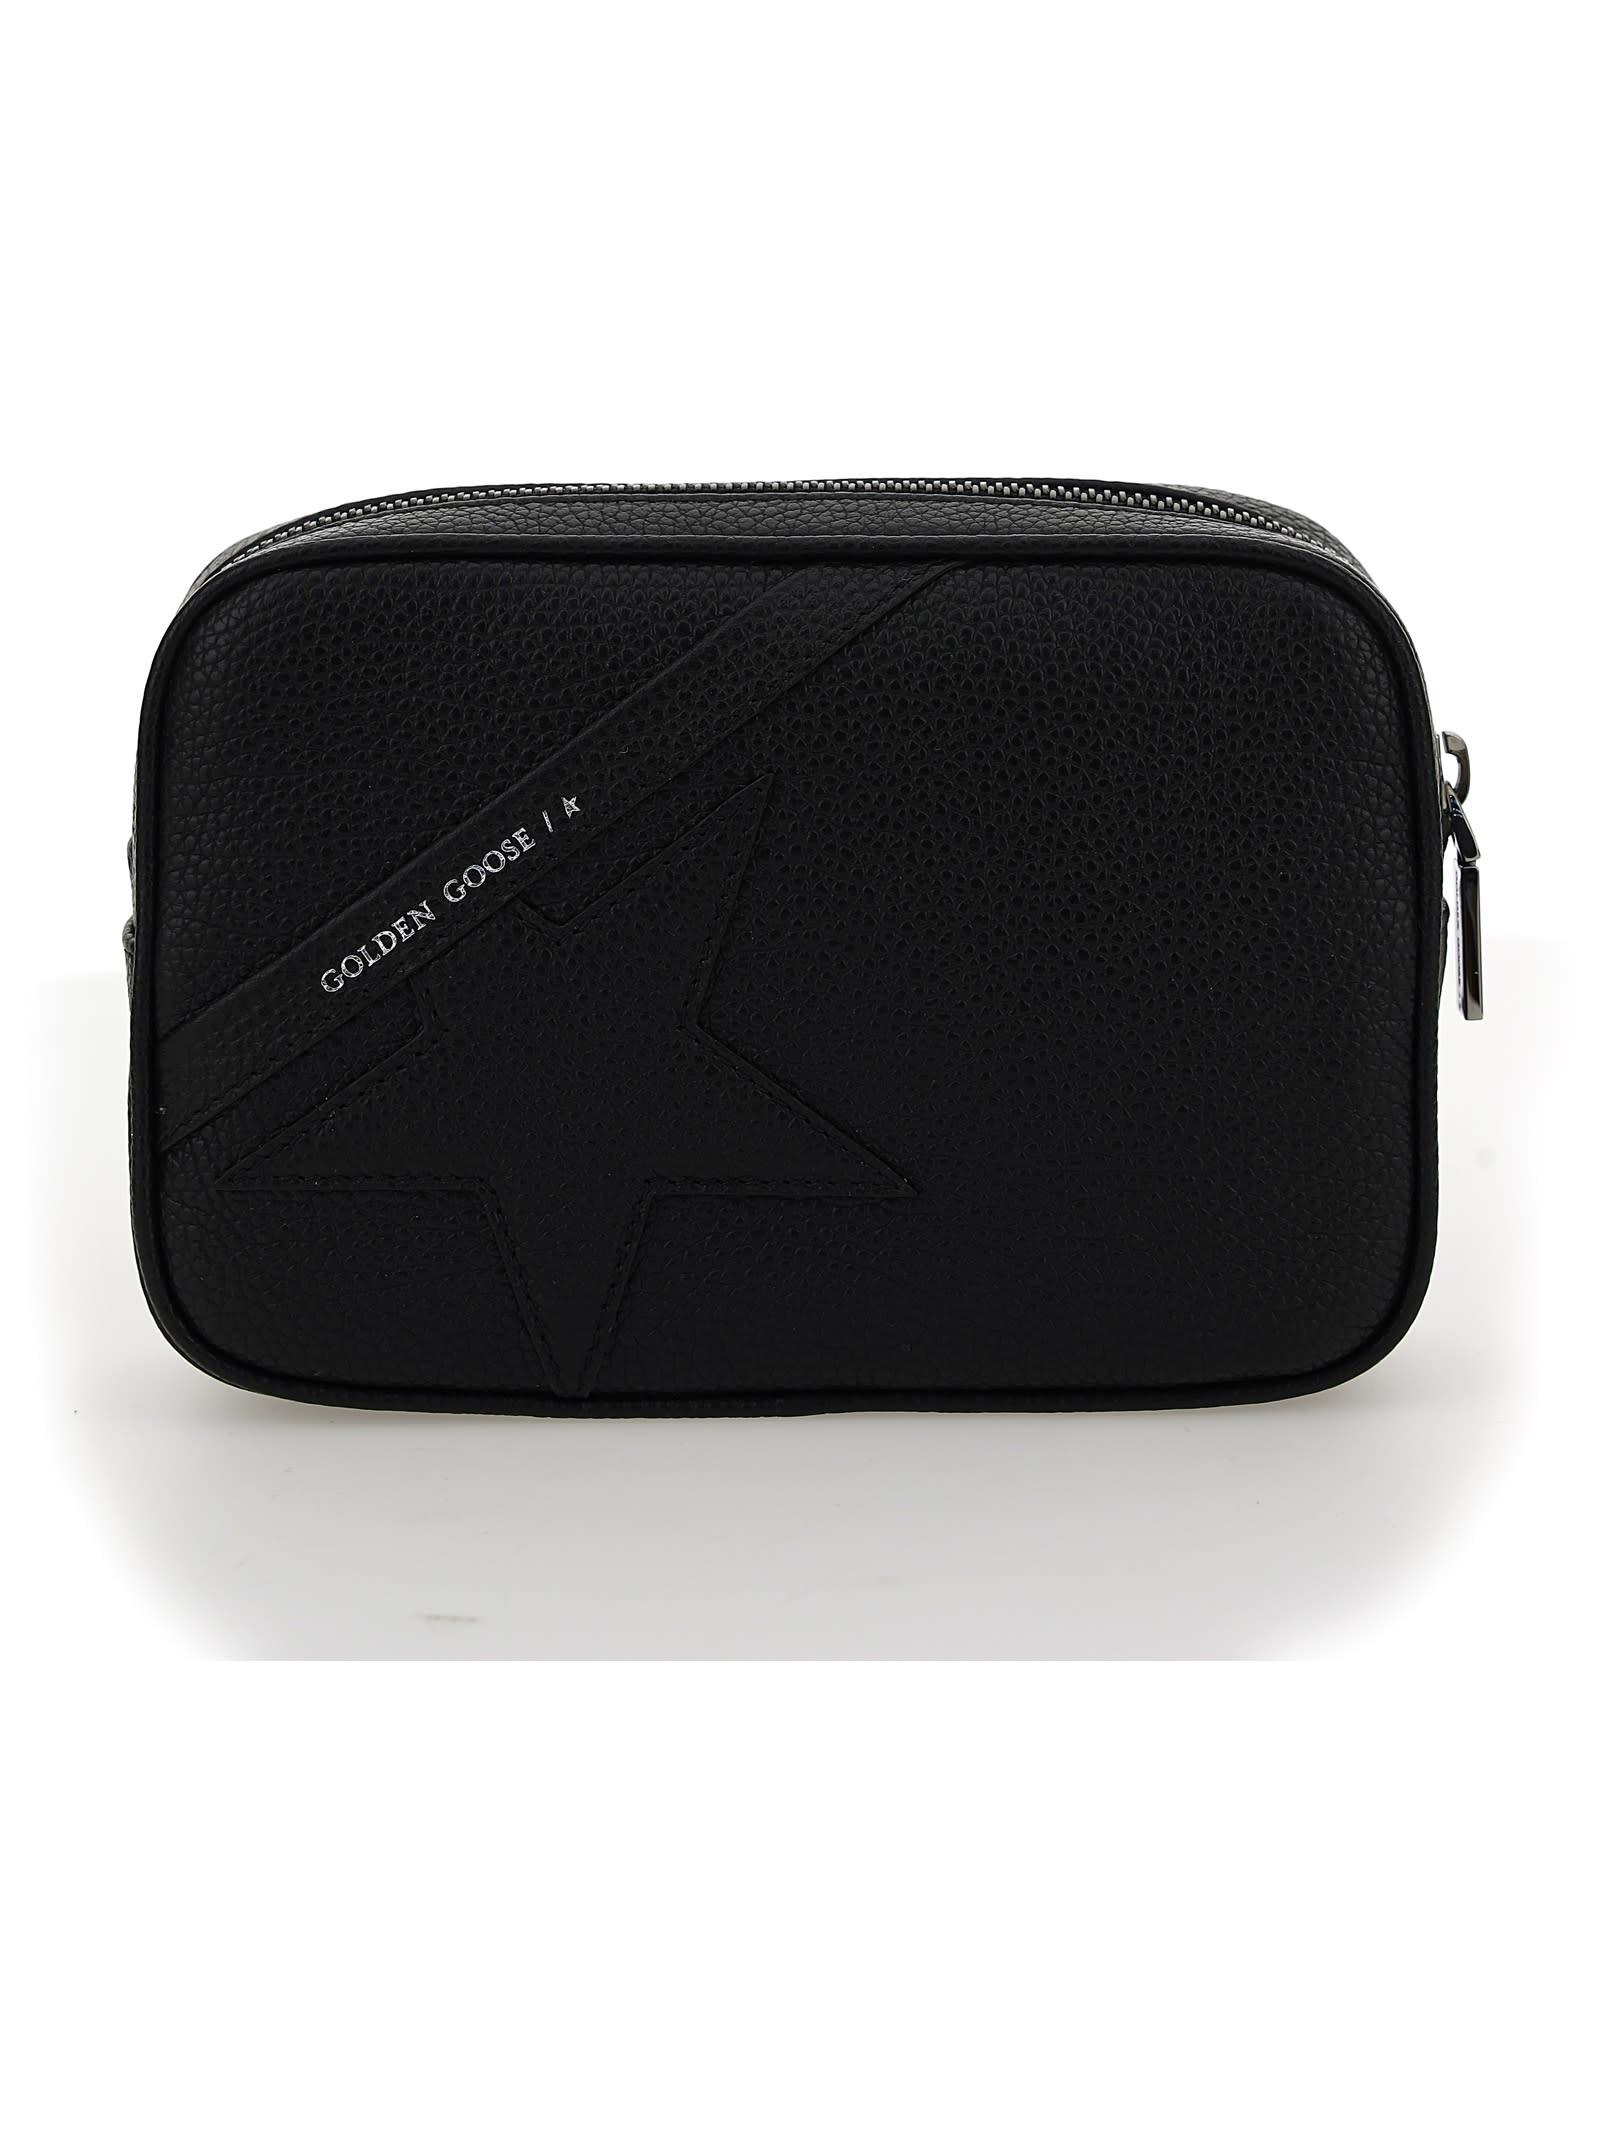 Black Leather Star Belt Bag by Golden Goose, brand logo on front, zip closure on top, adjustable and removable shoulder strap, brand logo inside. Composition: 100% Calf Leather Bos Taurus